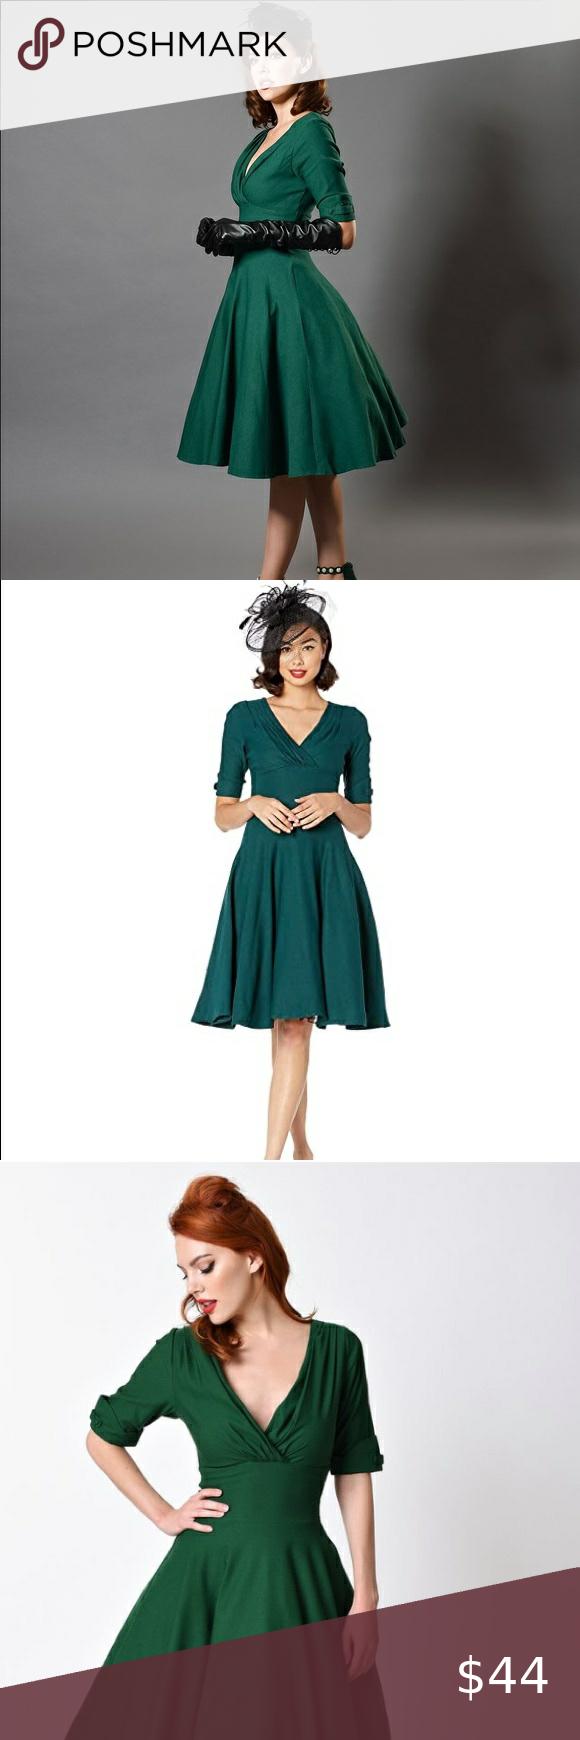 Unique Vintage Emerald Green Delores Swing Dress Swing Dress Colorful Dresses Unique Vintage Dresses [ 1740 x 580 Pixel ]